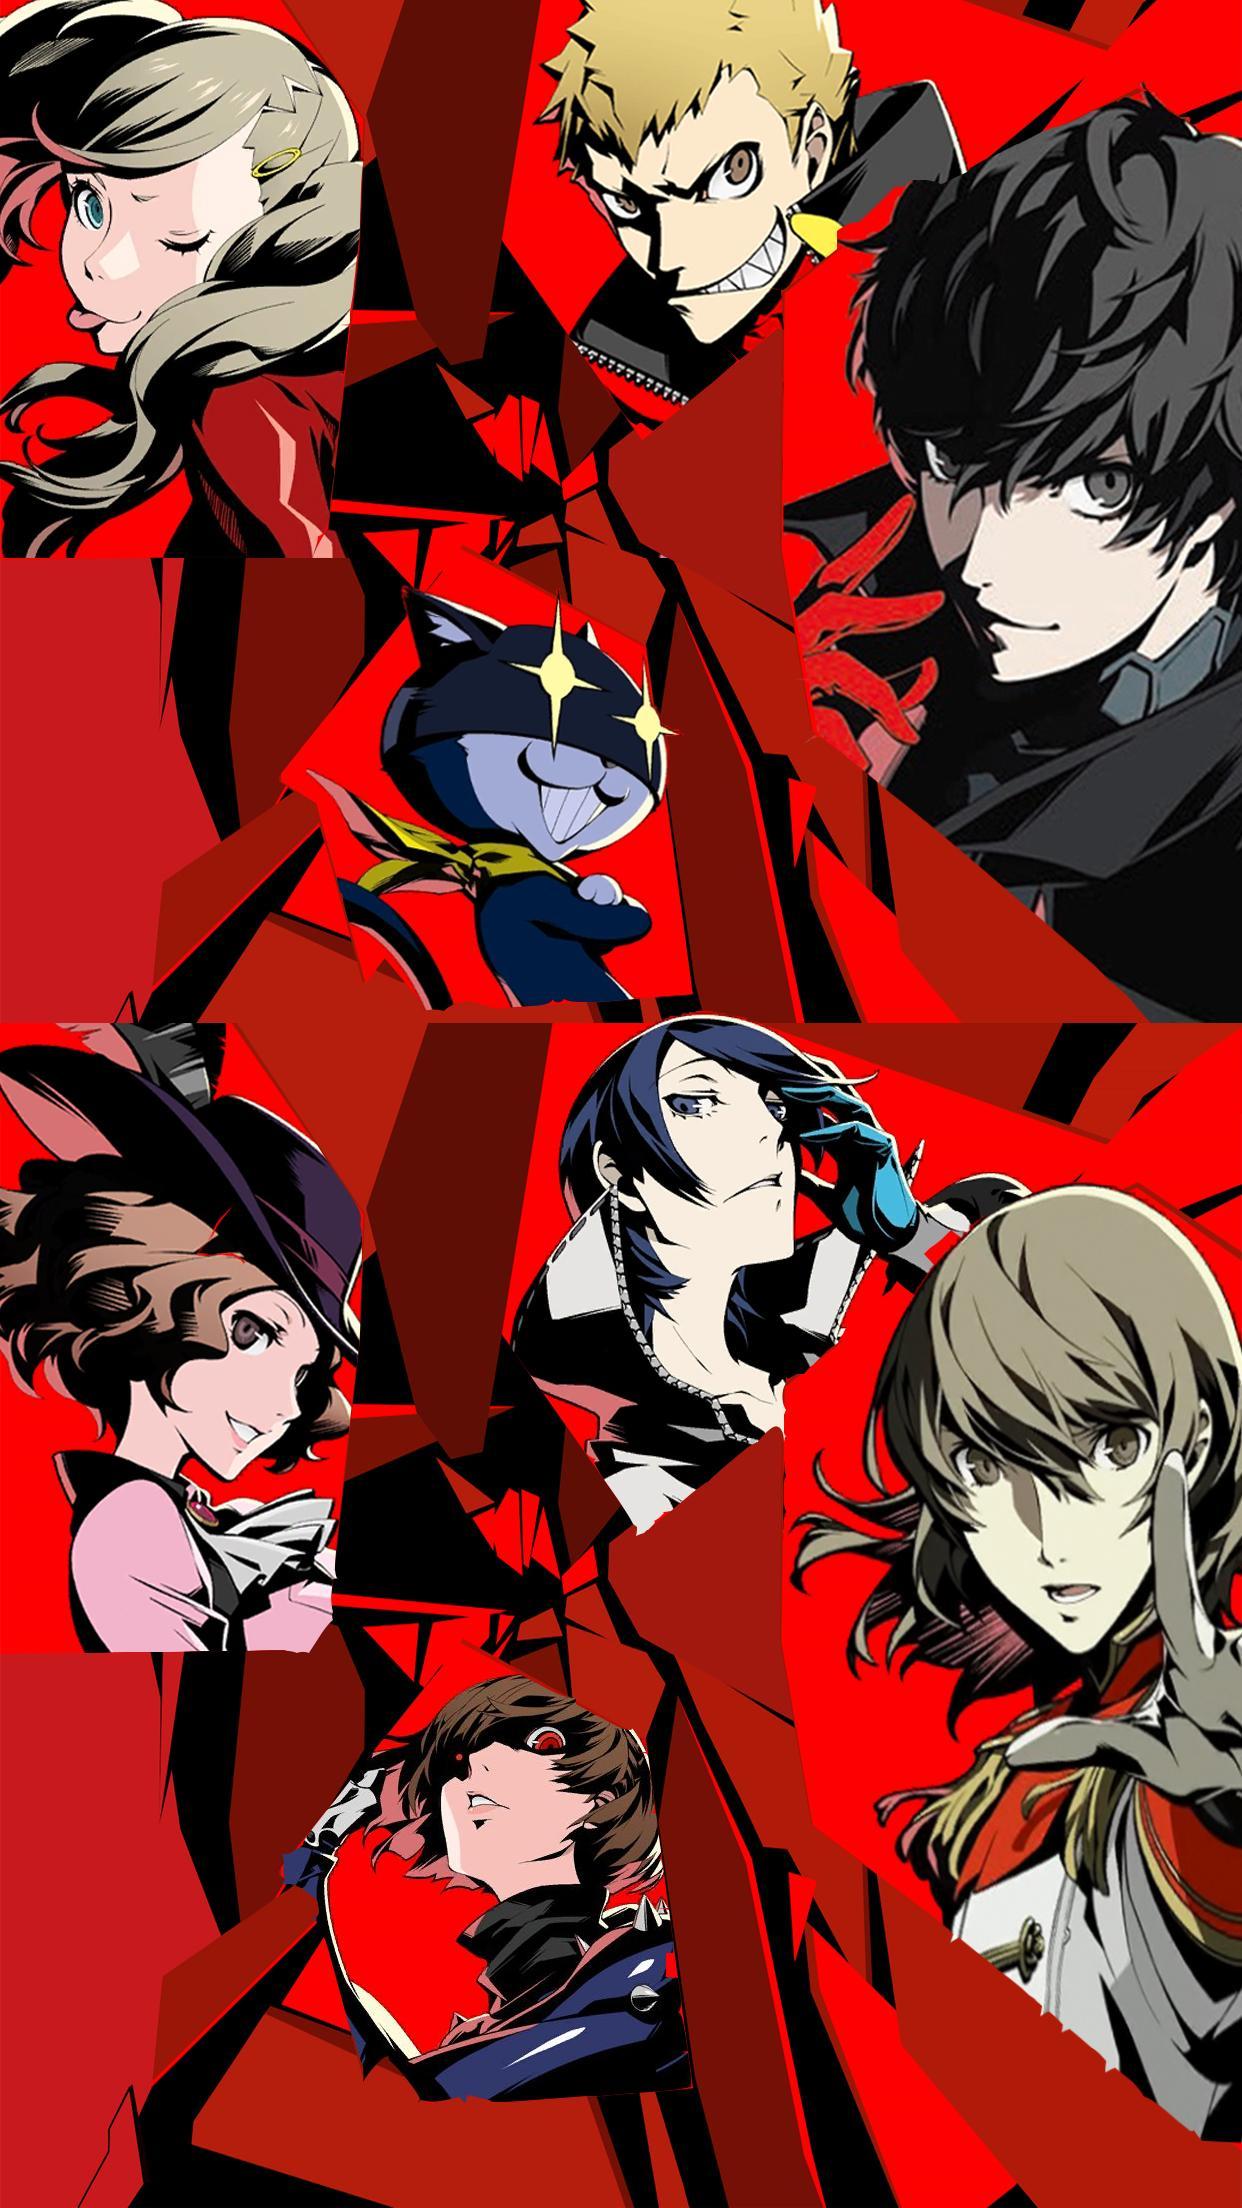 Persona 5 Royal Dlc 3113301 Hd Wallpaper Backgrounds Download